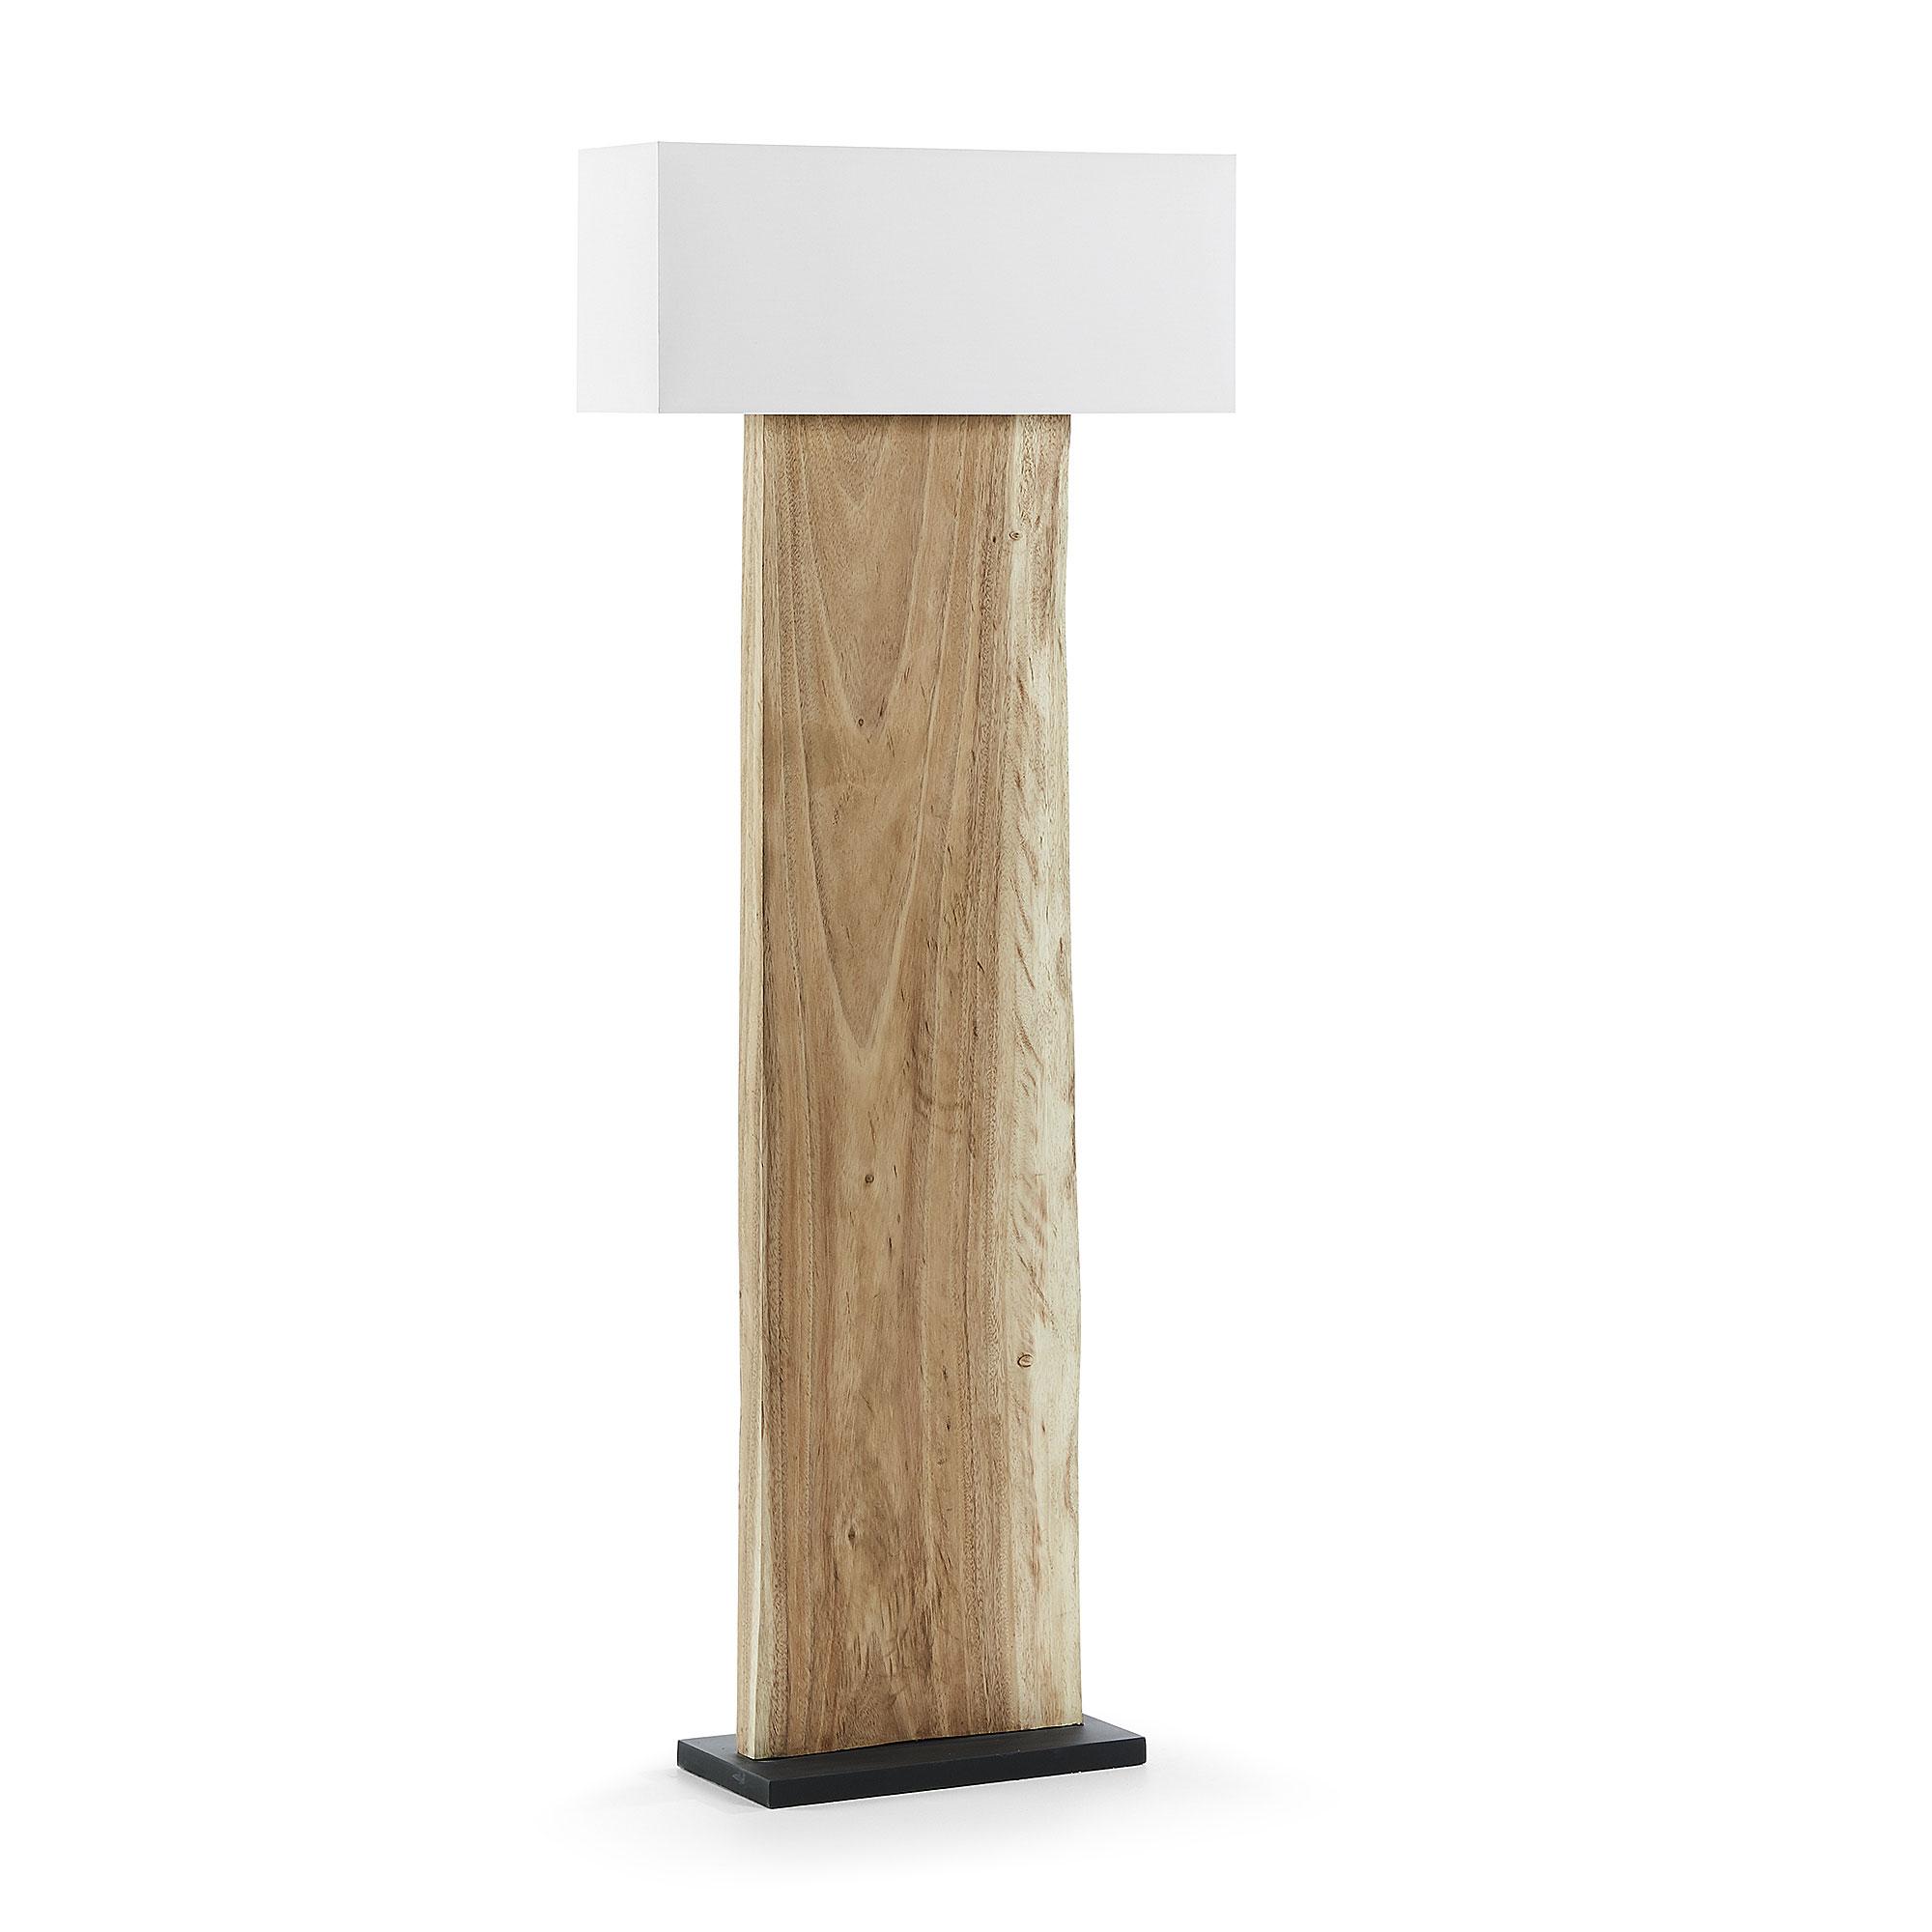 Kave Home Vloerlamp 'Annika', kleur Wit